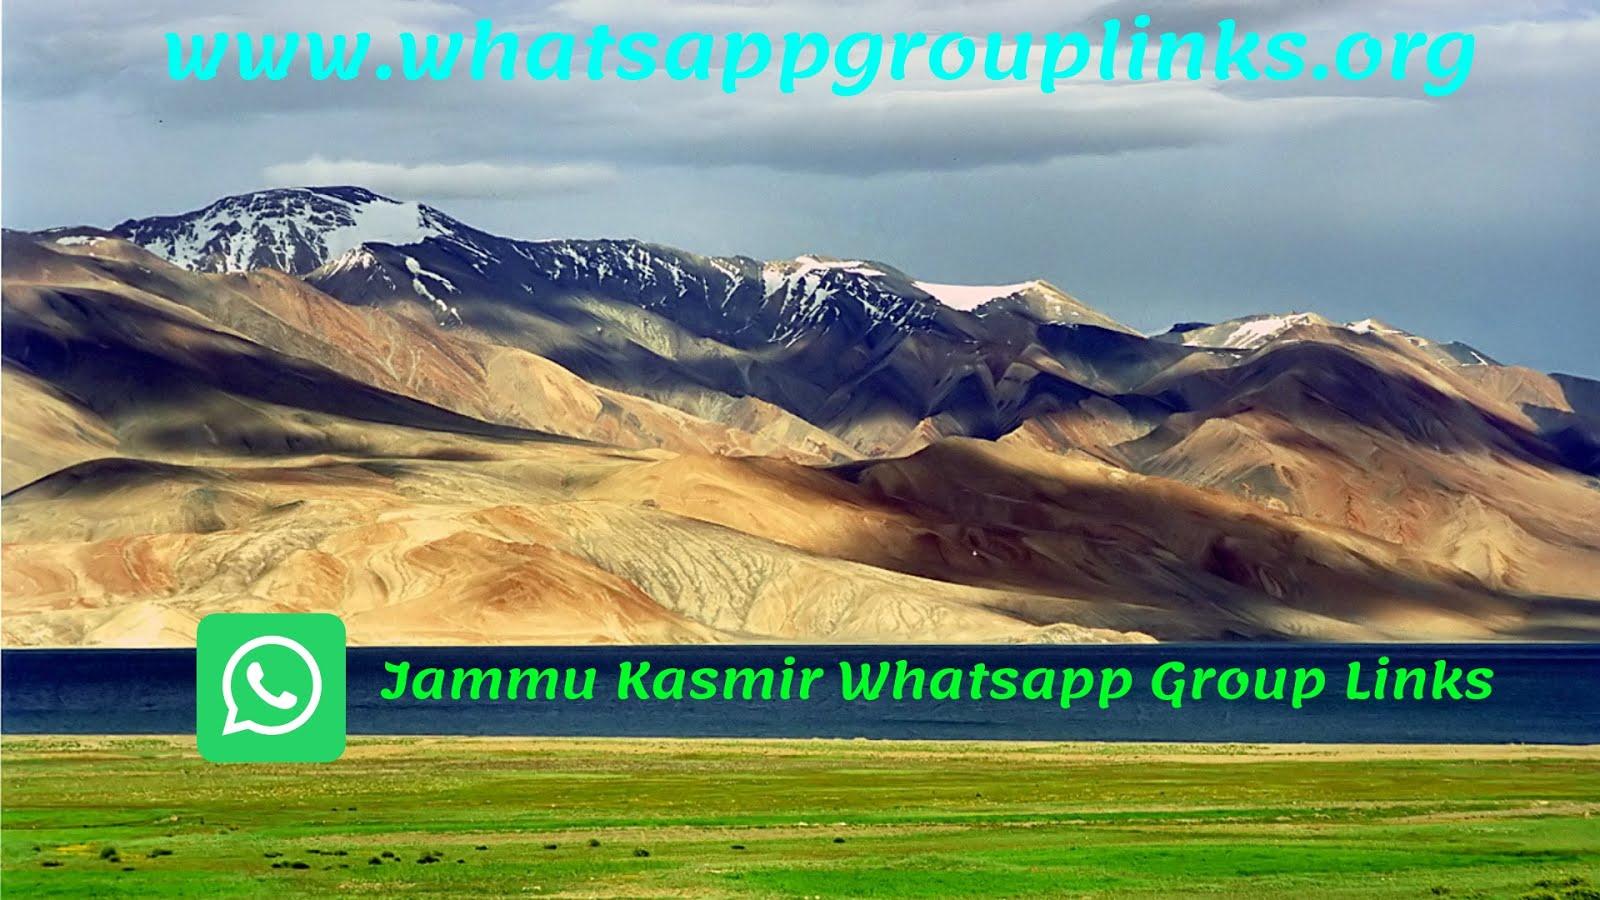 Join Jammu Kashmir Whatsapp Group Links List - Android Group APK